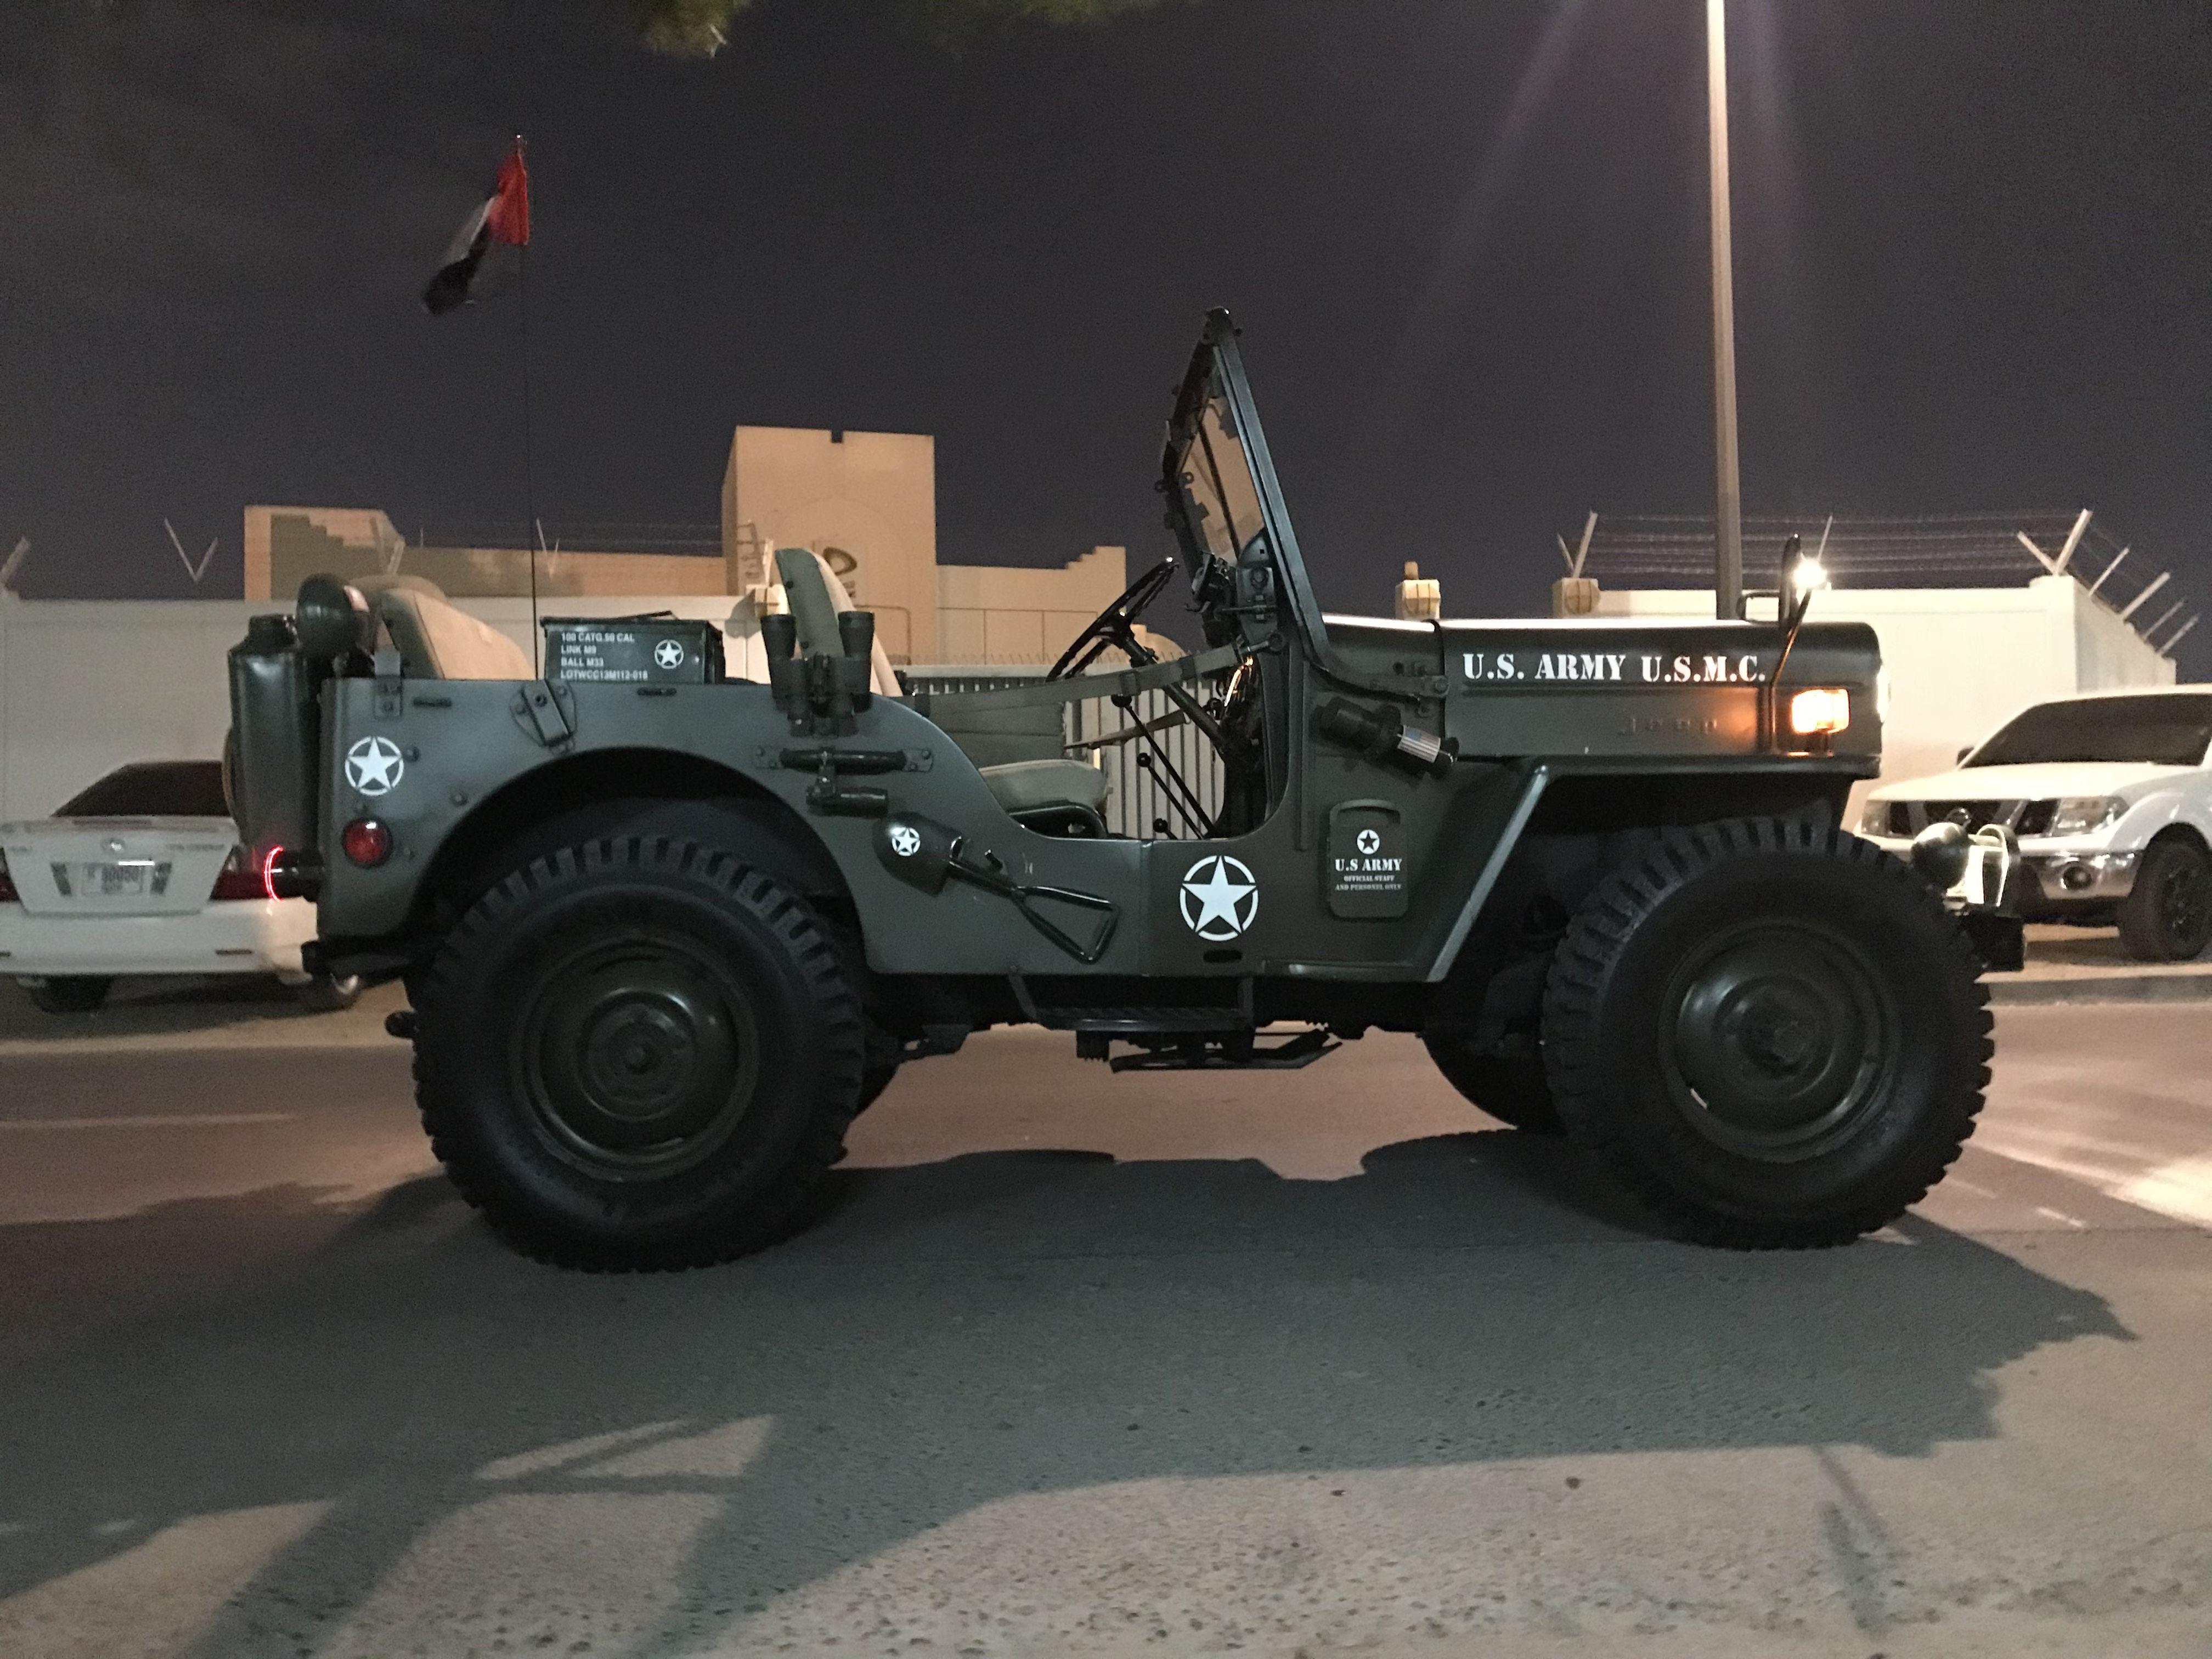 Pin By Willysdubai On Jeep Willys Dubai Willys Jeep Military Jeep Classic Jeeps